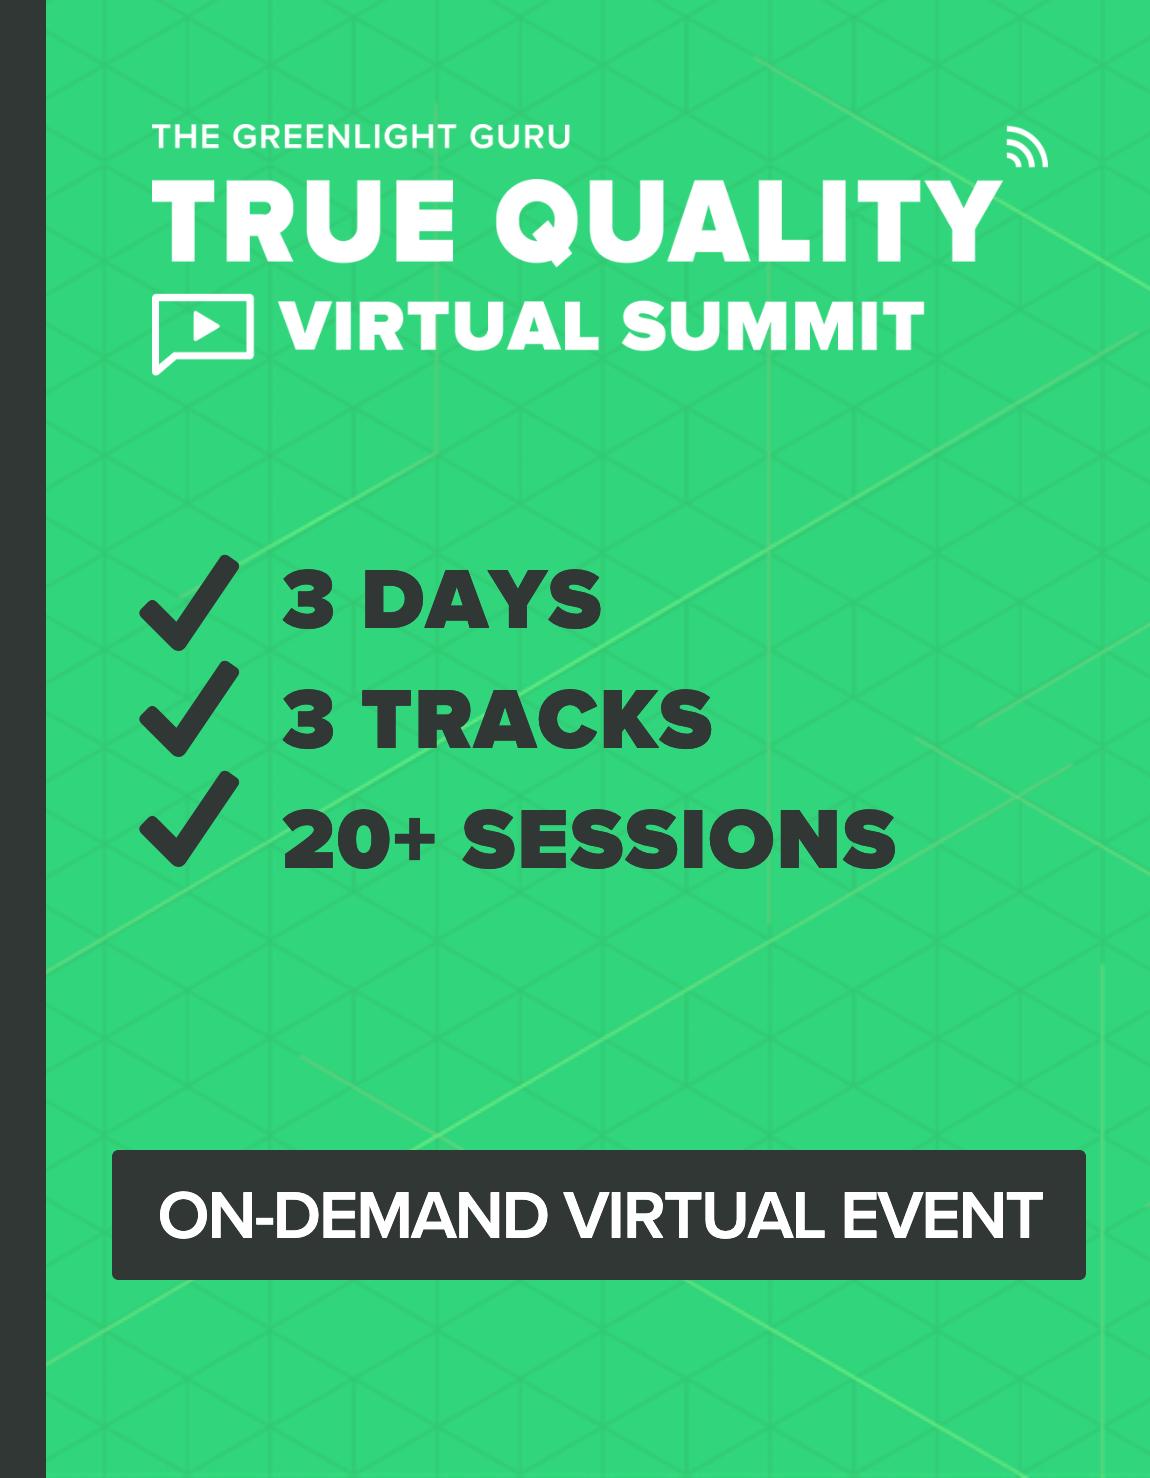 TQVS on-demand promo - slide-in